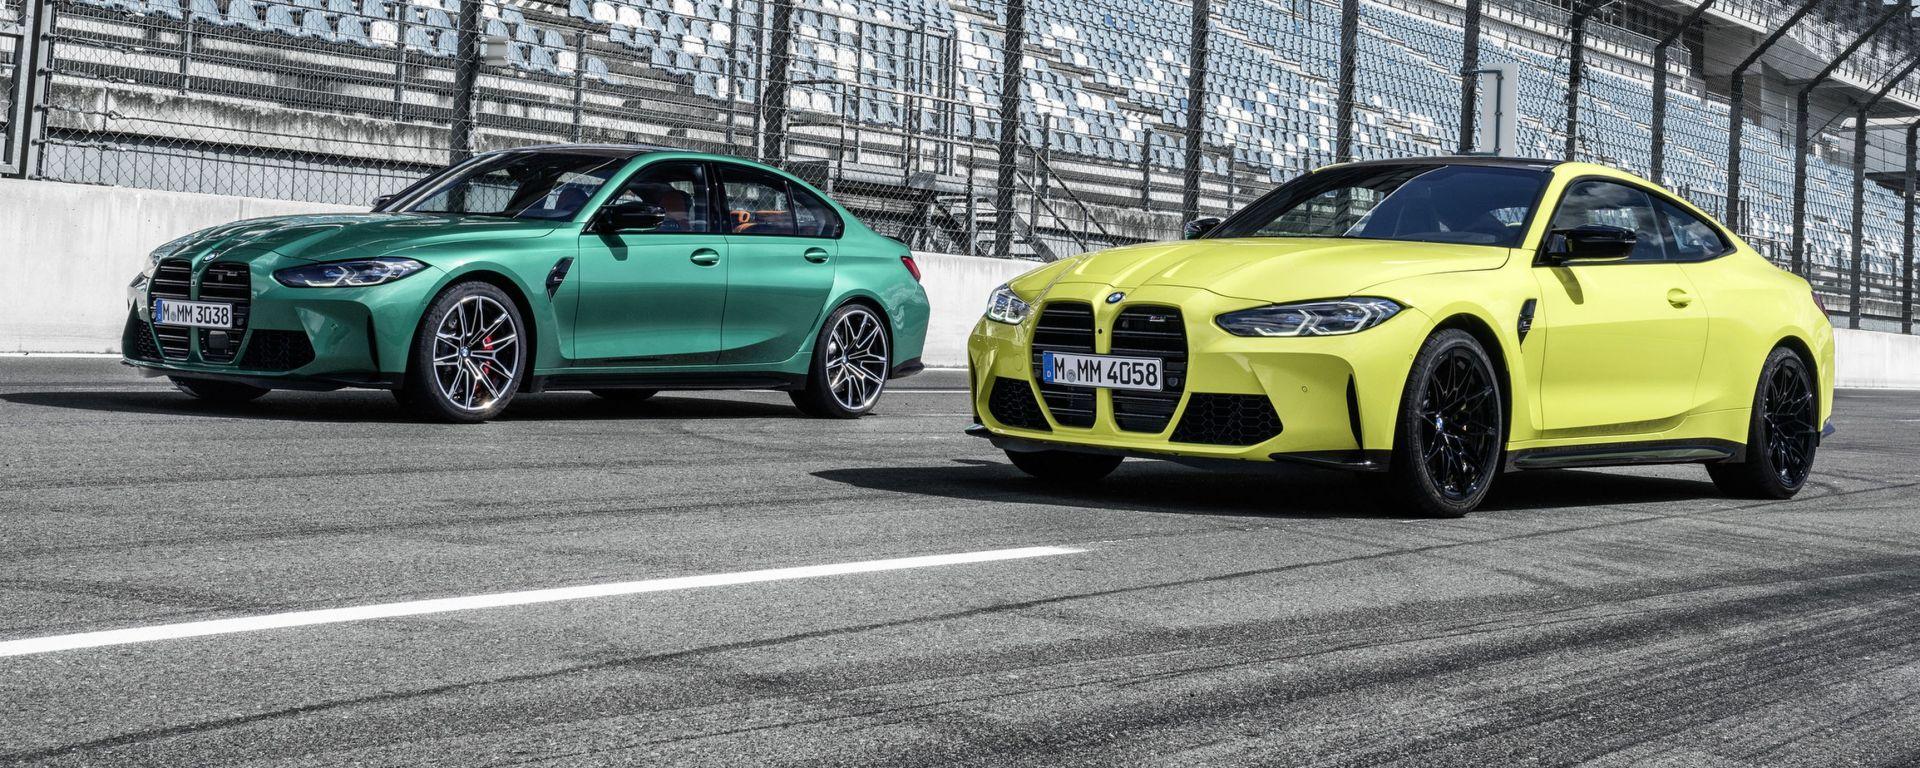 BMW a MIMO 2021: le M3 e M4 Competion